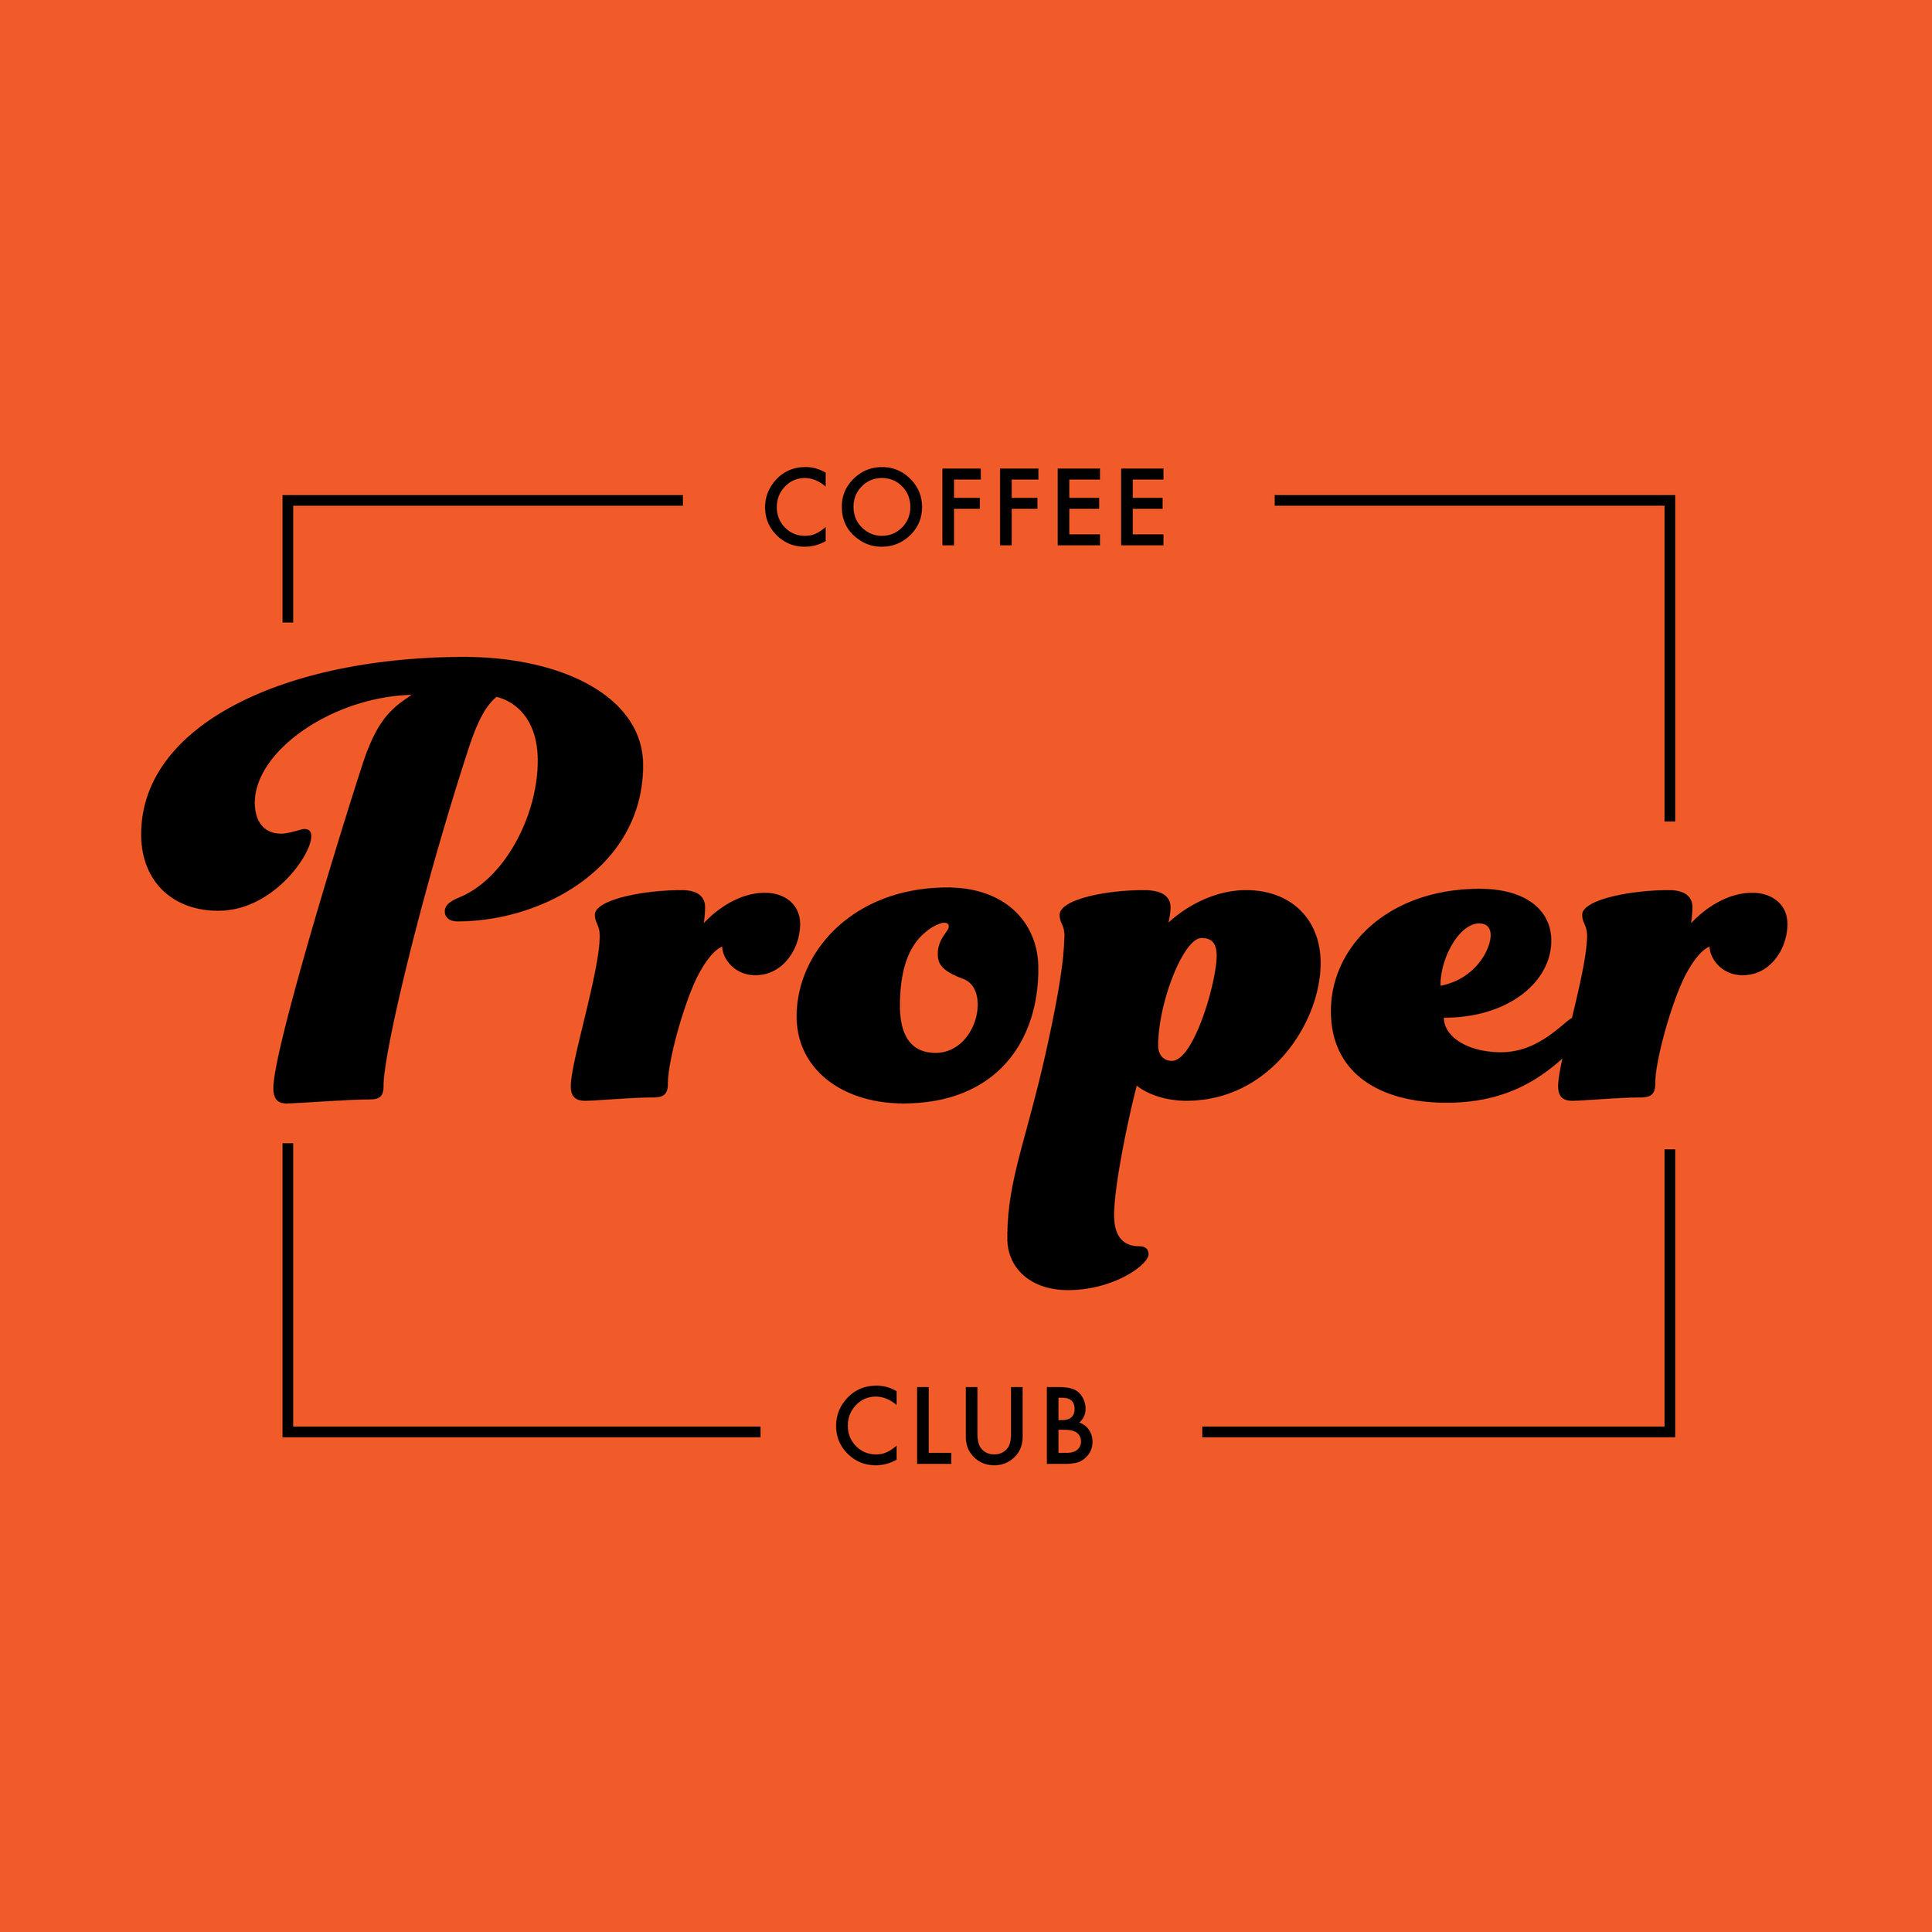 Proper Coffee Club